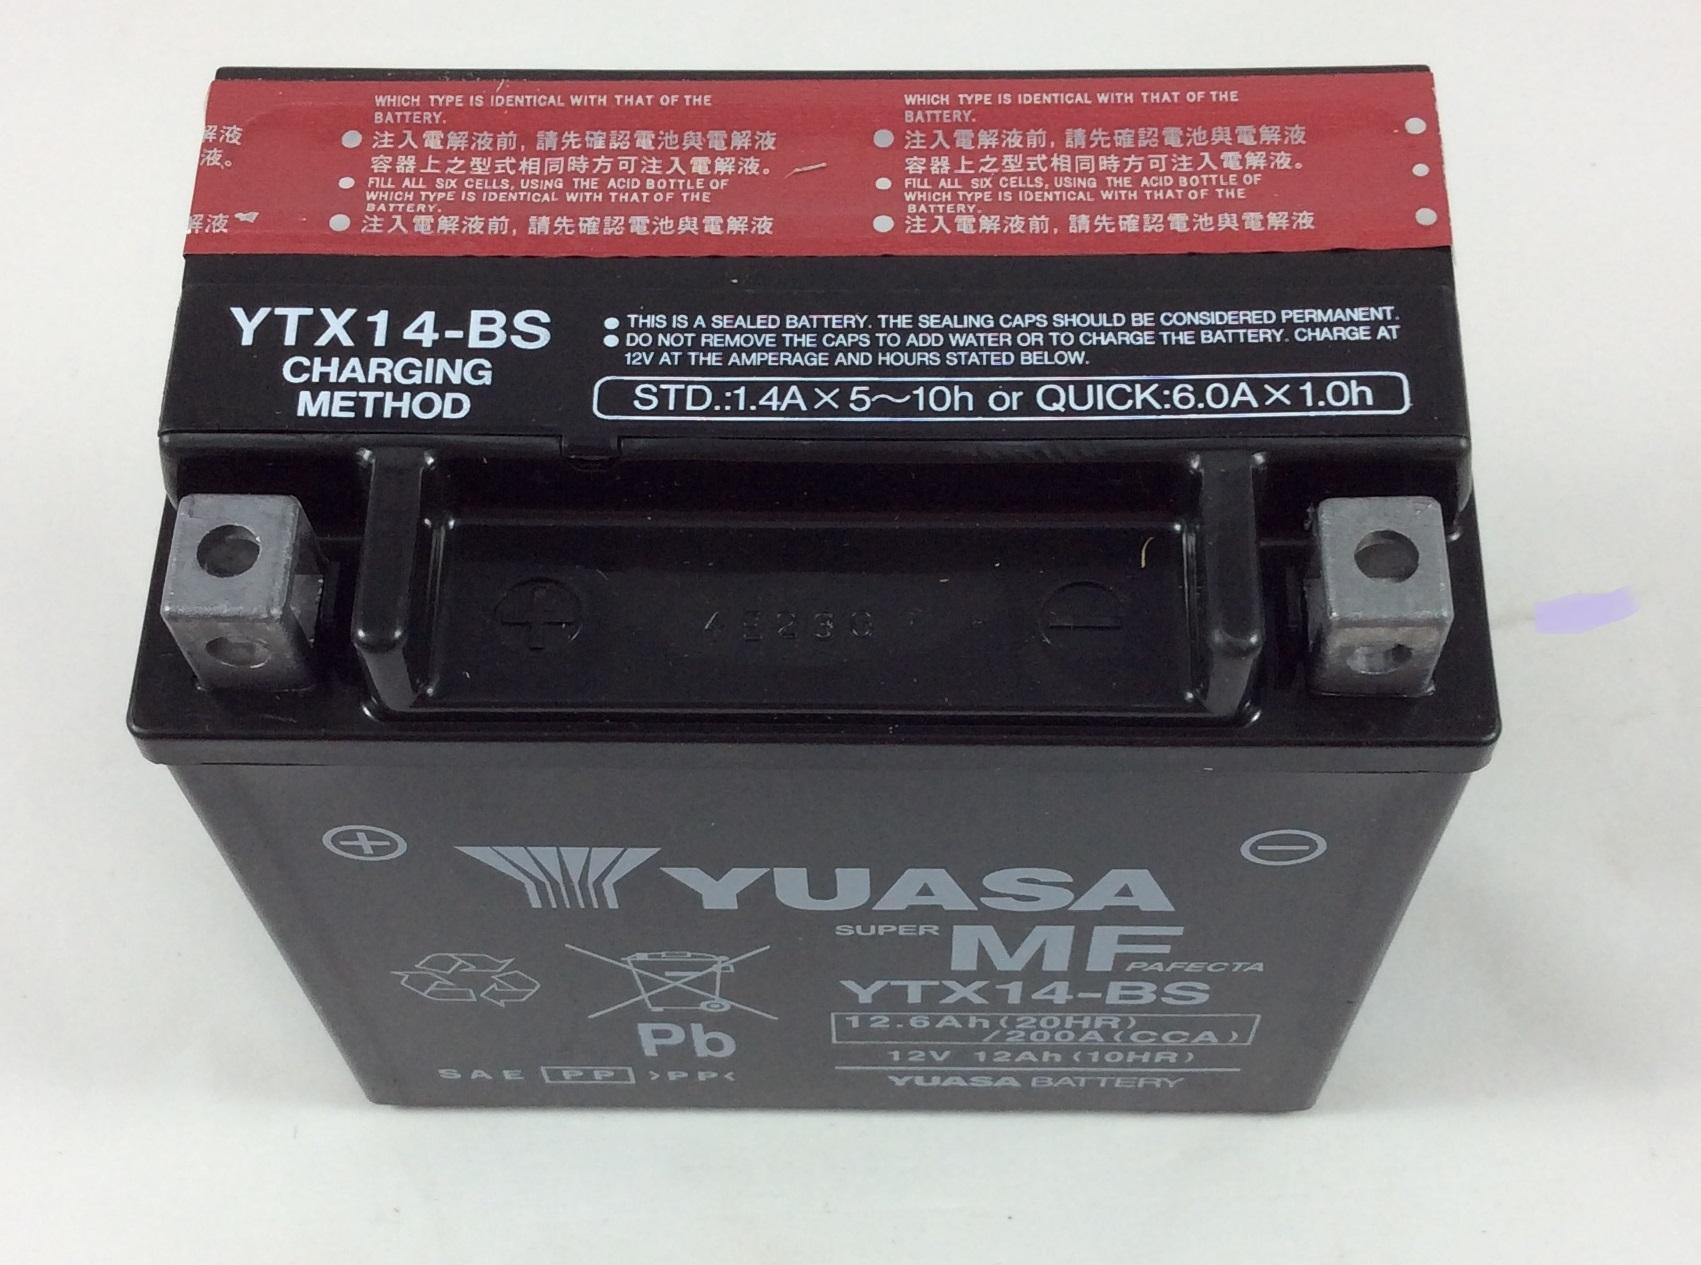 BATTERIA MOTO-SCOOTER YUASA 12V 12AH YTX14-BS